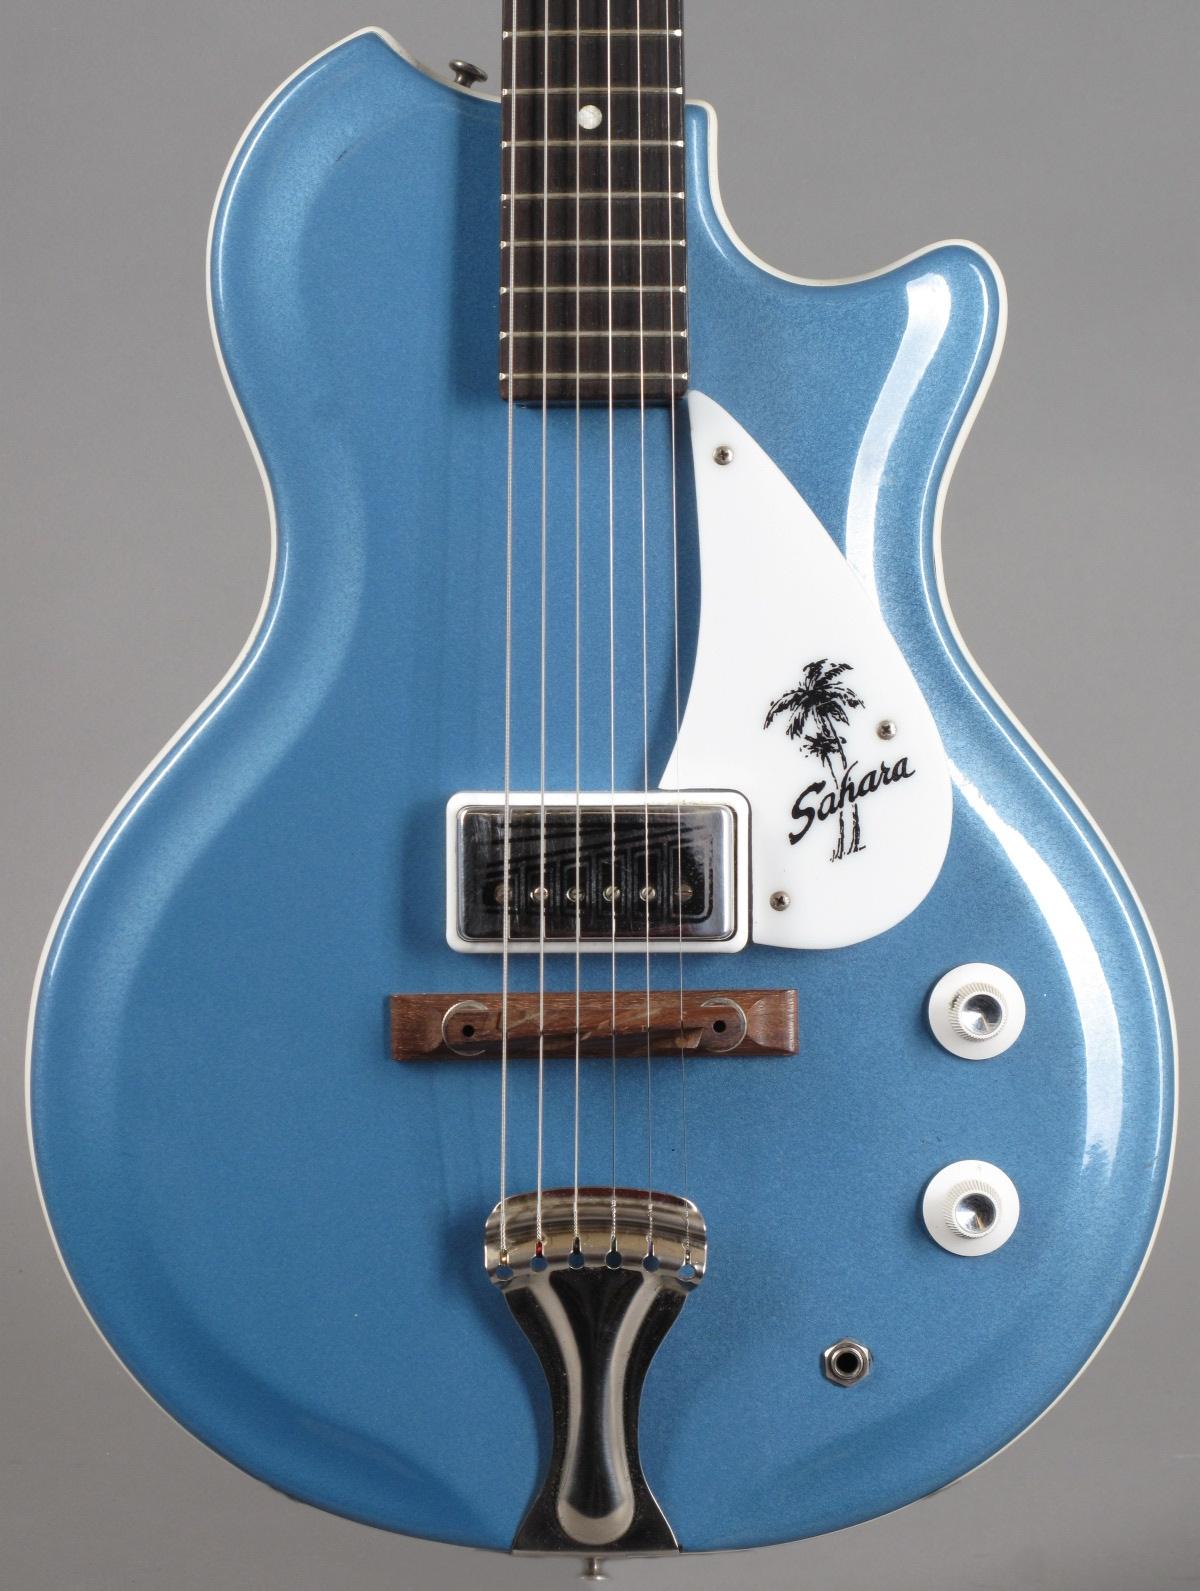 1964 Supro Sahara - Wedgewood Blue